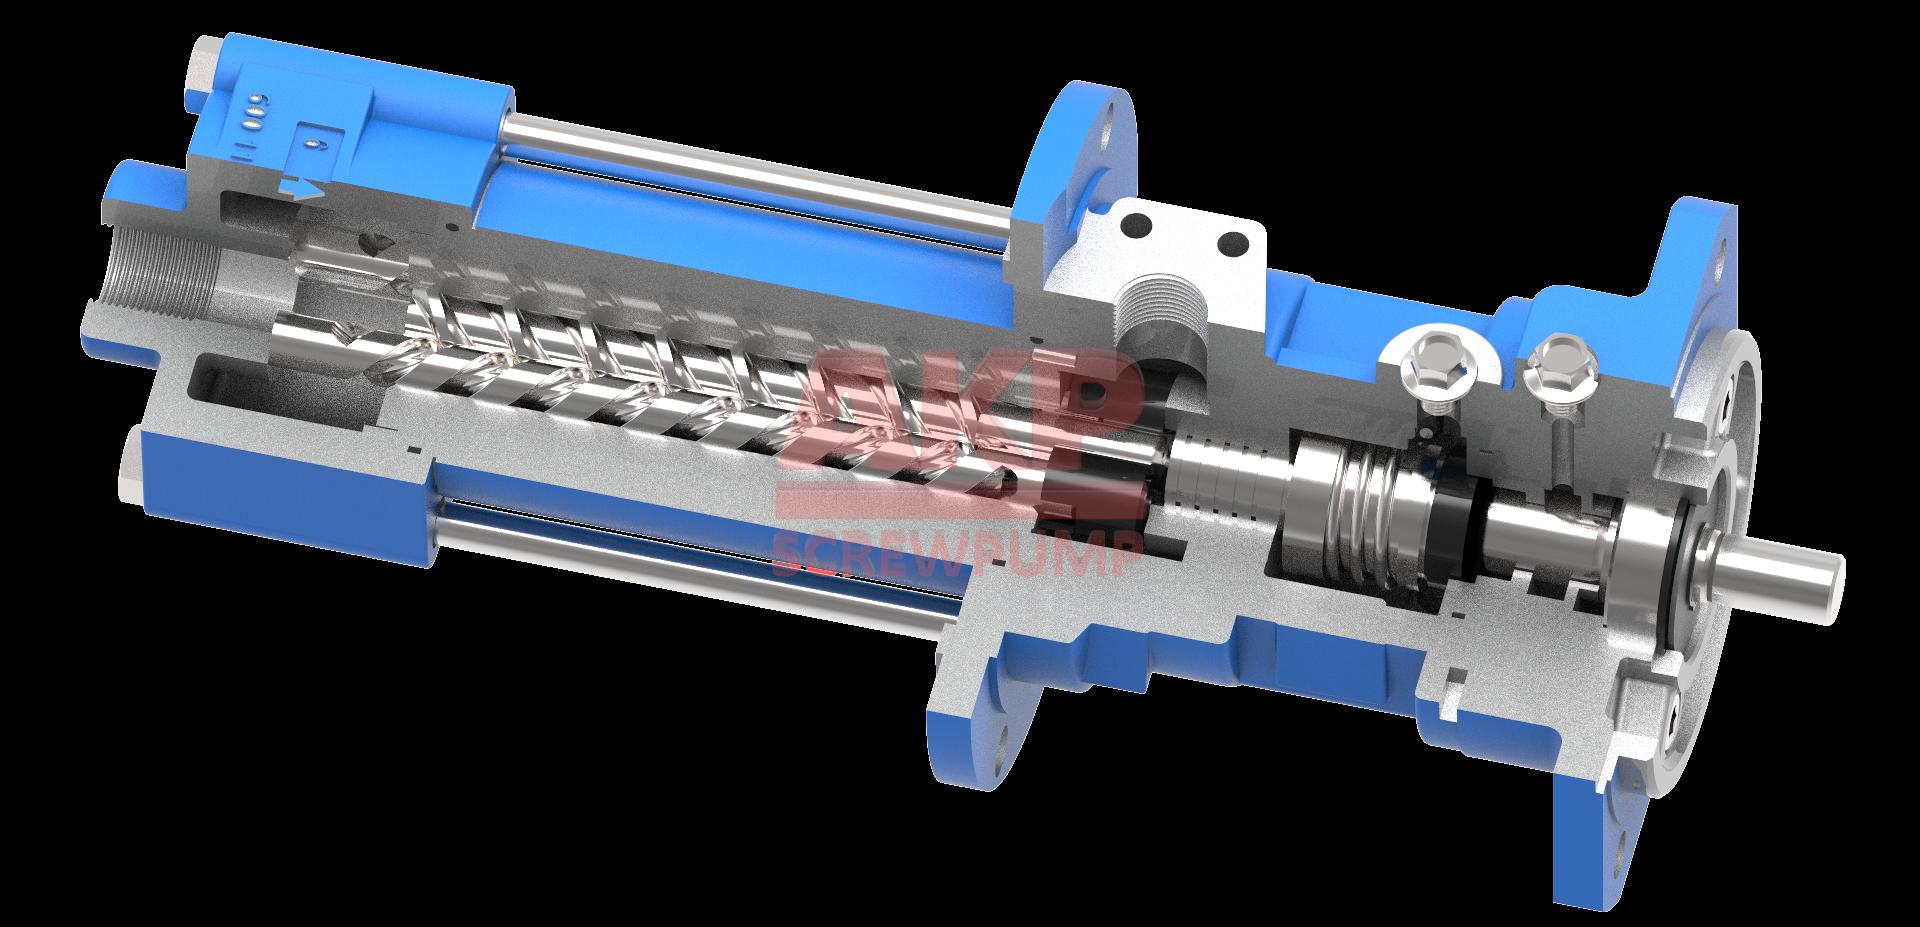 MTS 40-70R46D8.6高速切削刀具冷却断屑排屑专用高压机床冷却泵  4